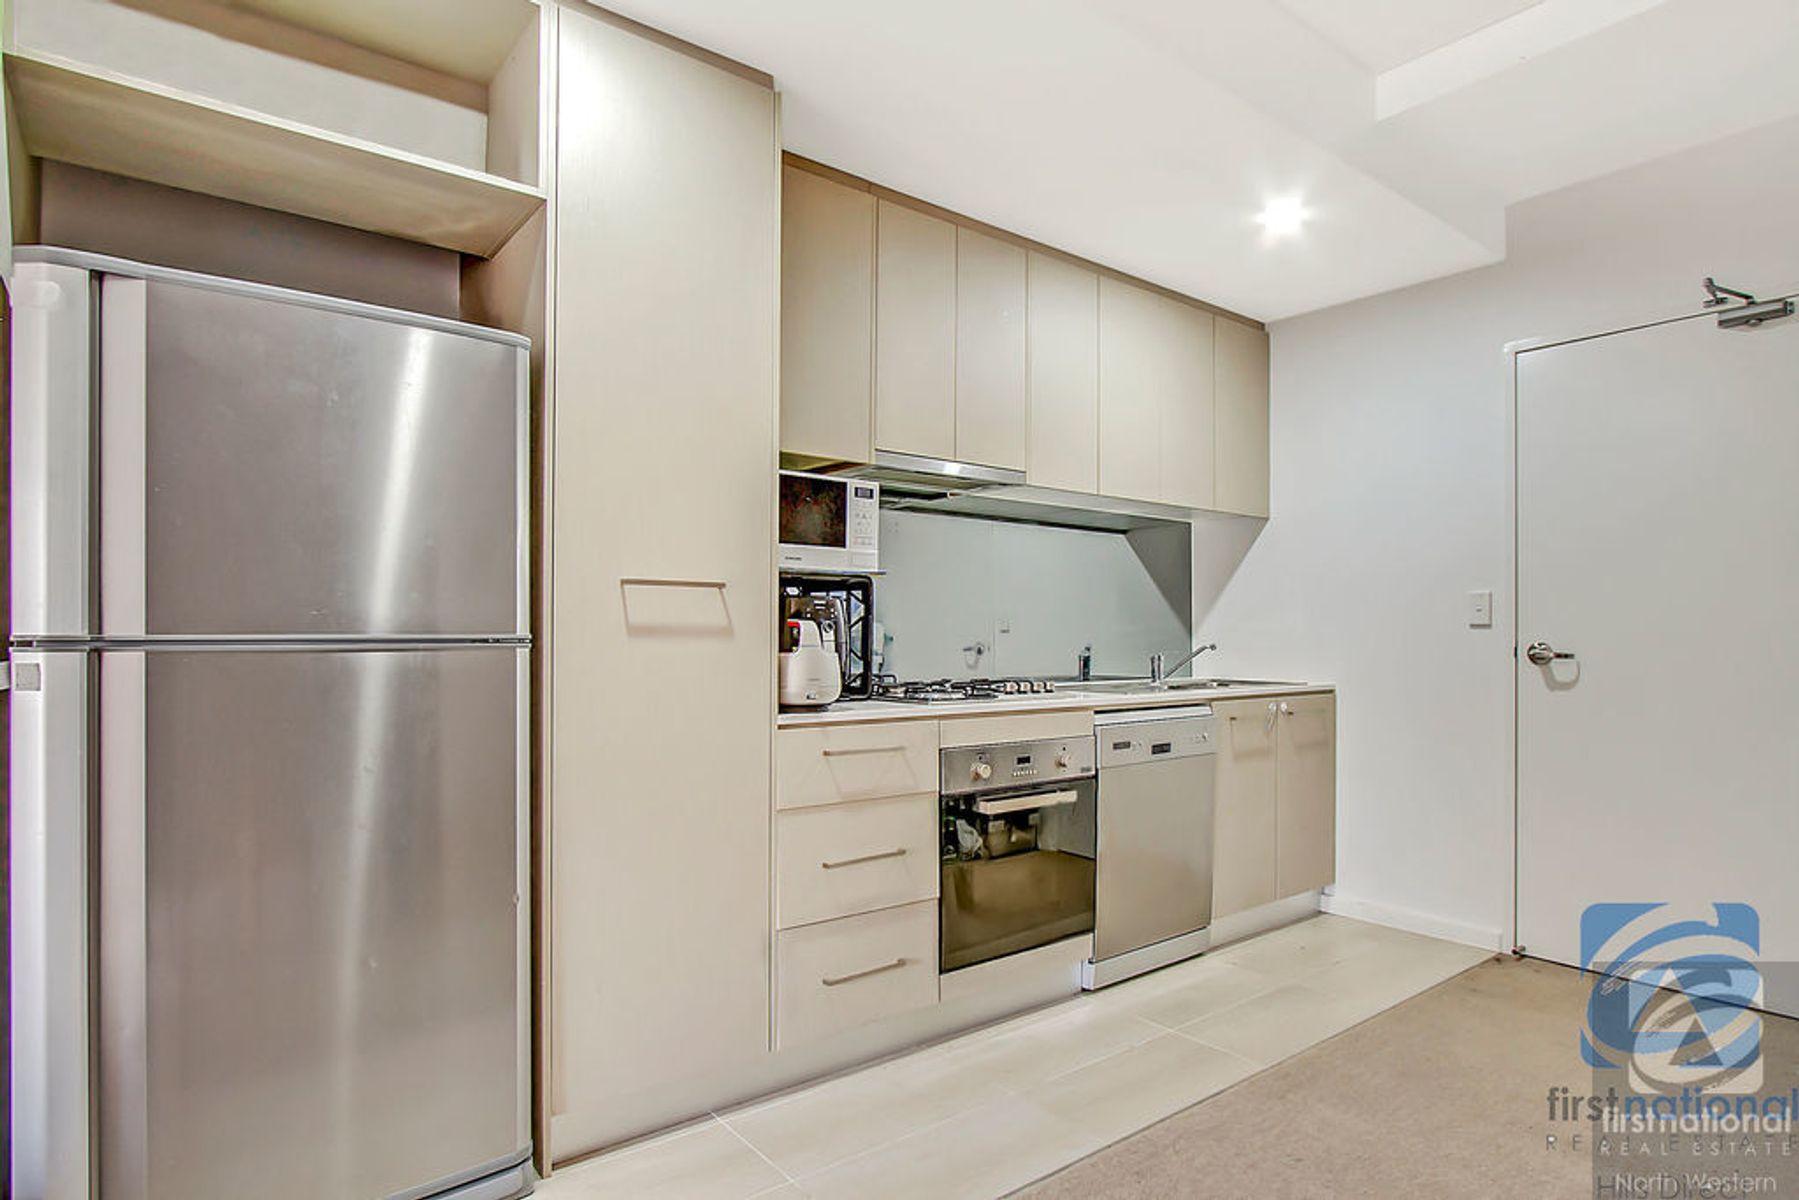 Level 5/56 The Avenue, Mount Druitt, NSW 2770